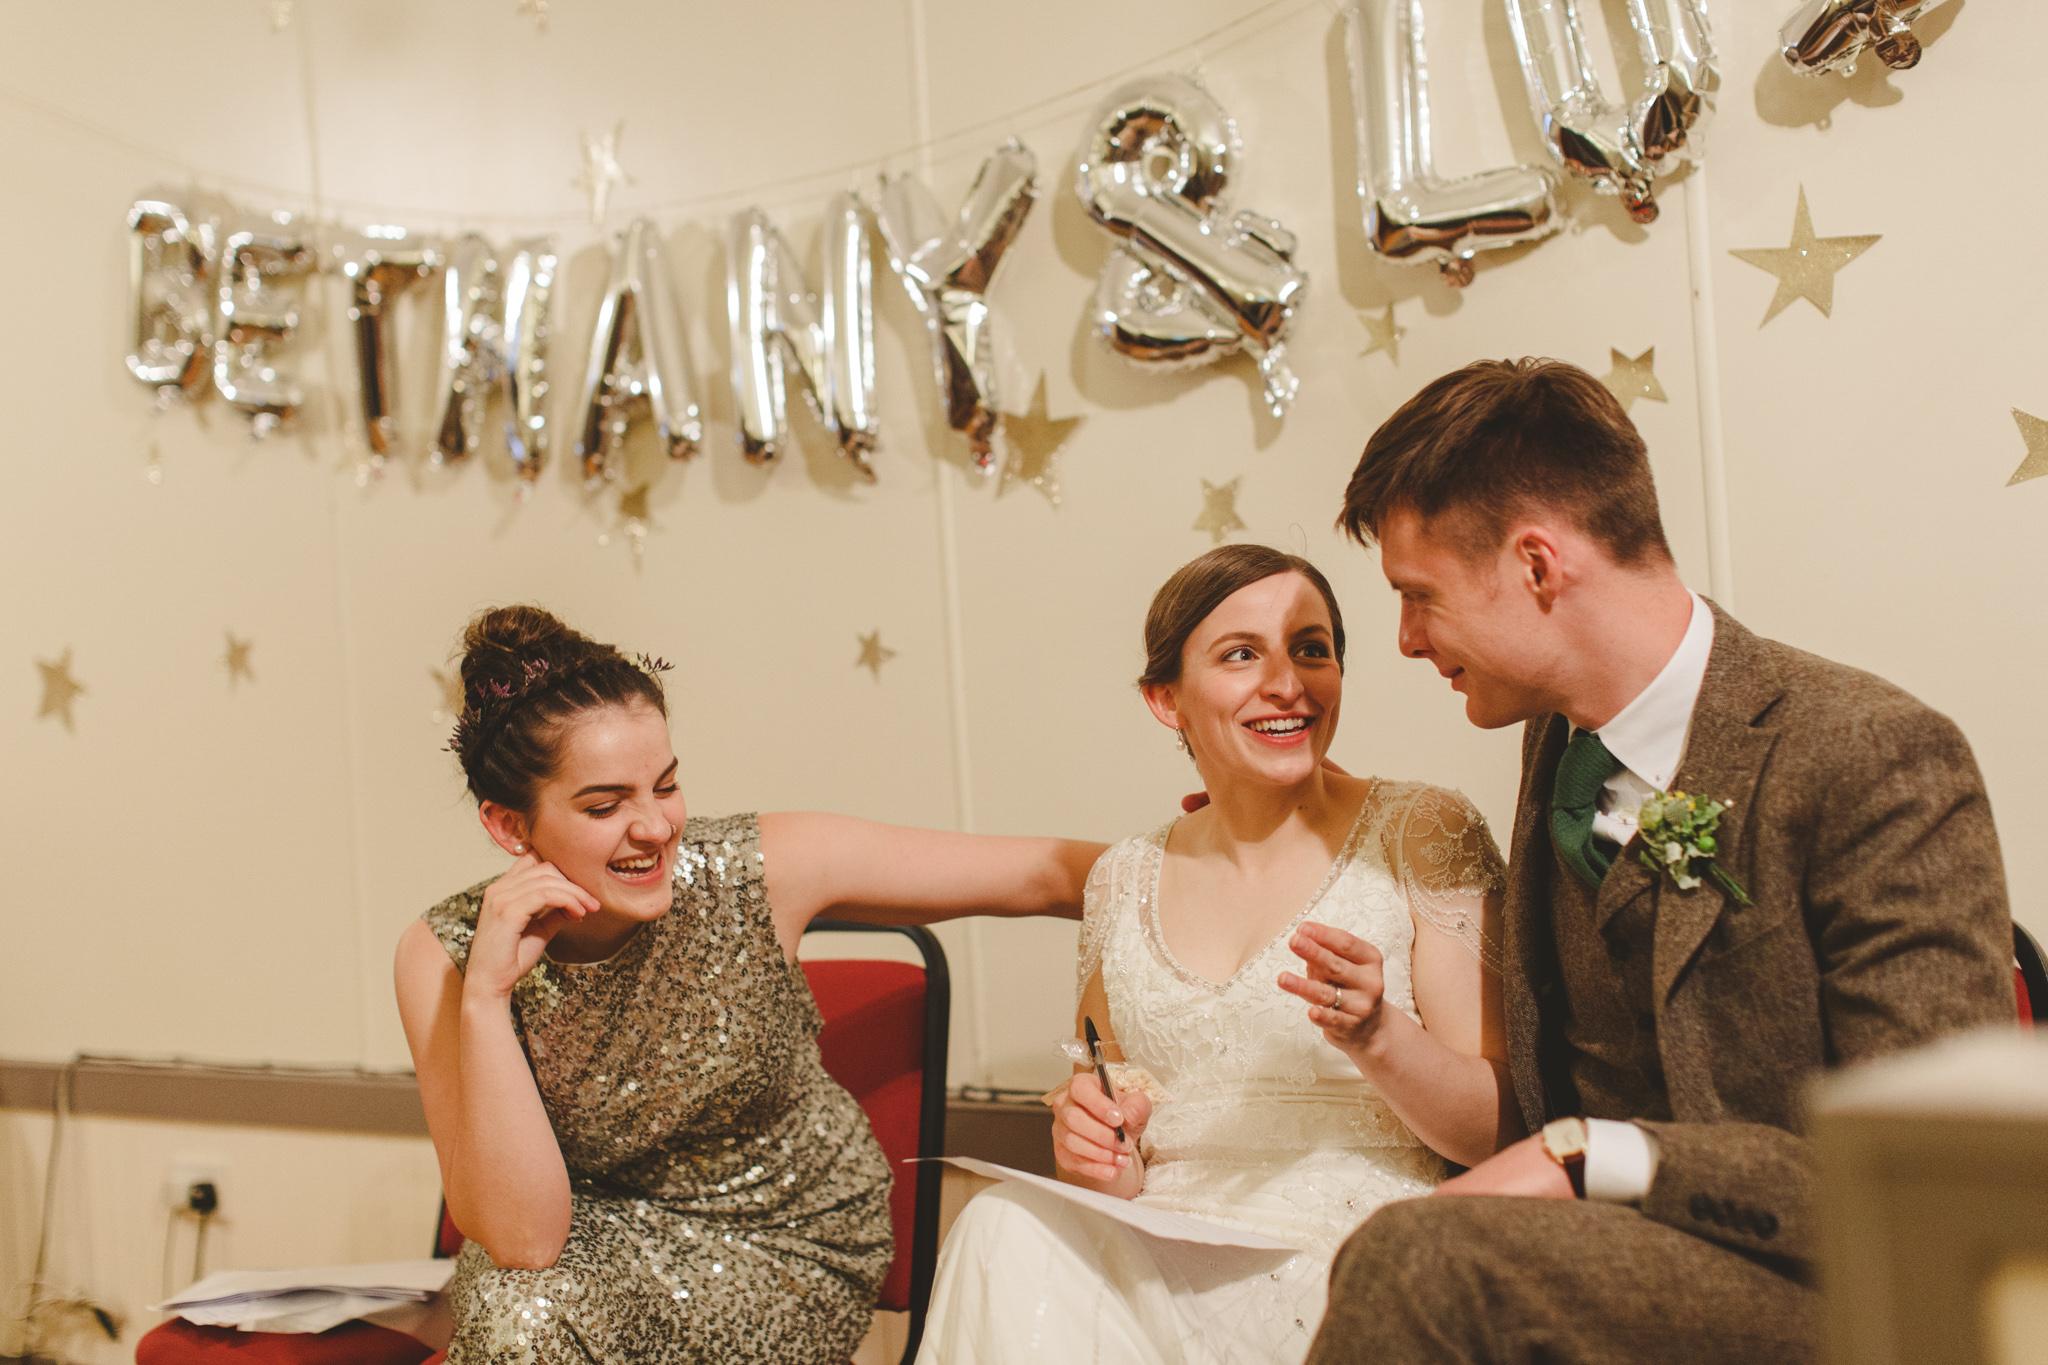 derbyshire-wedding-photographer-videographer-camera-hannah-41.jpg